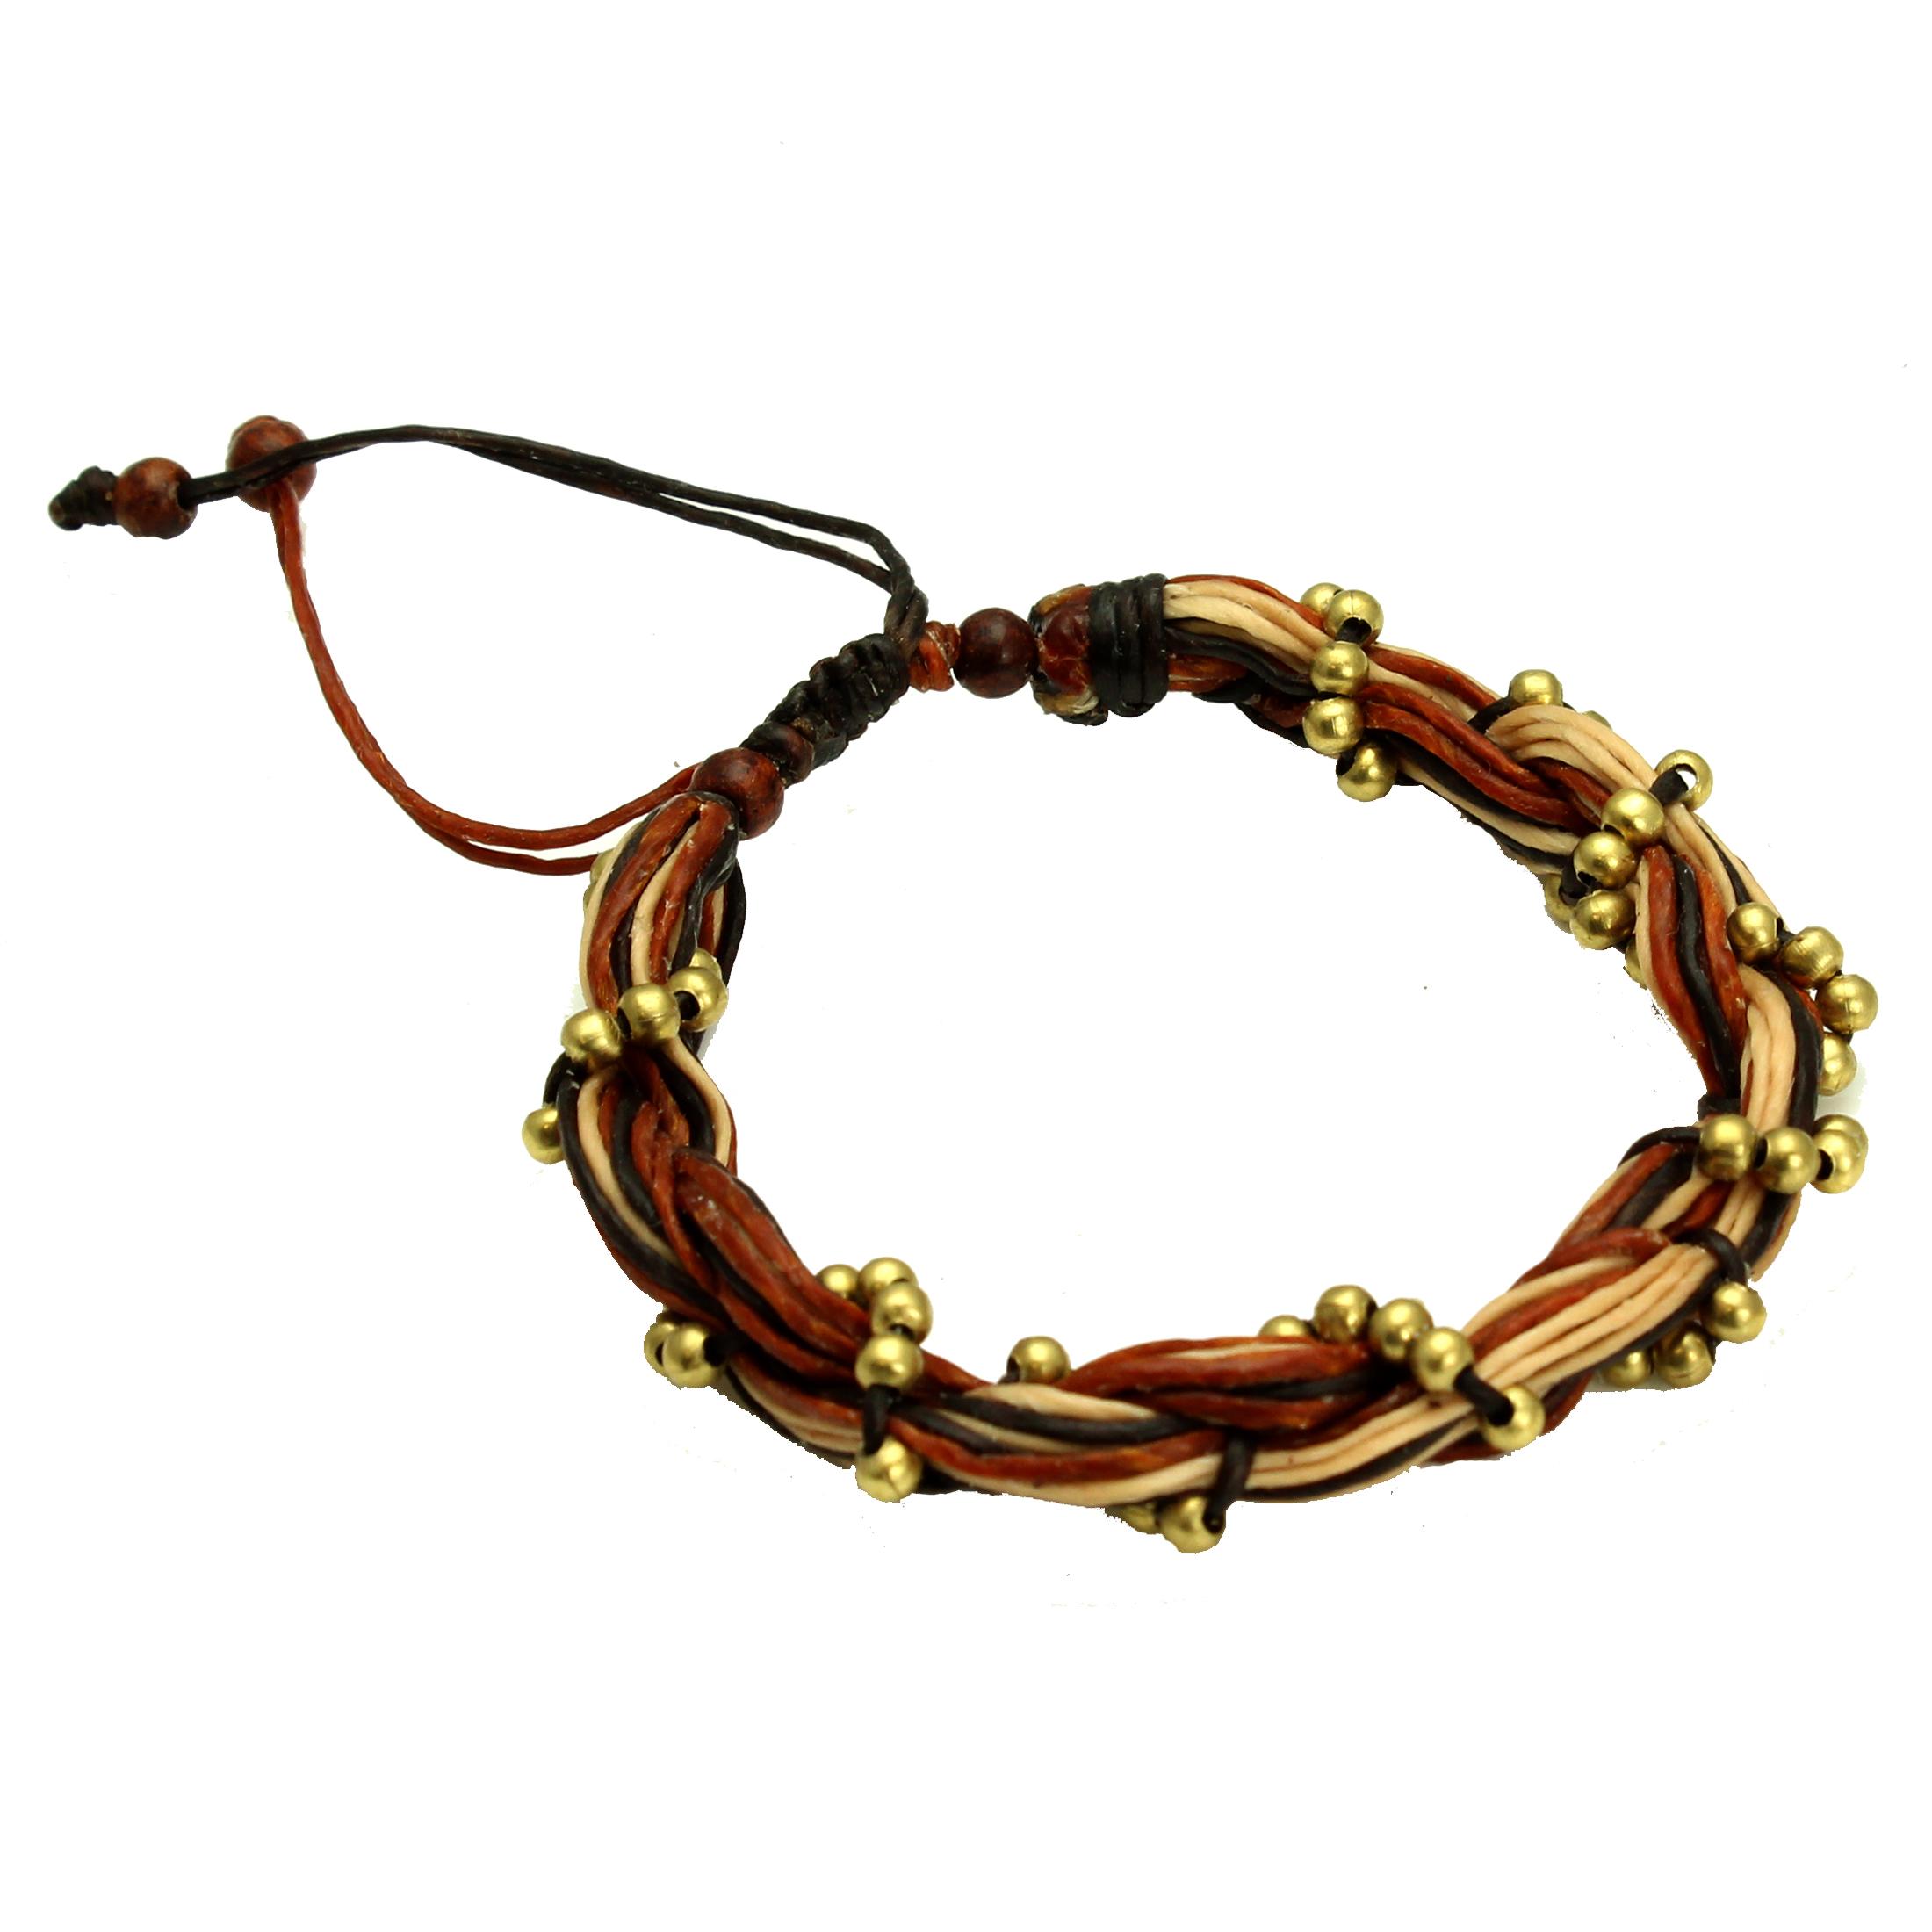 Adjustable Entwined Wax Brown Cord Vine Unisex Brass Bead Bracelet, Handmade Fair Trade